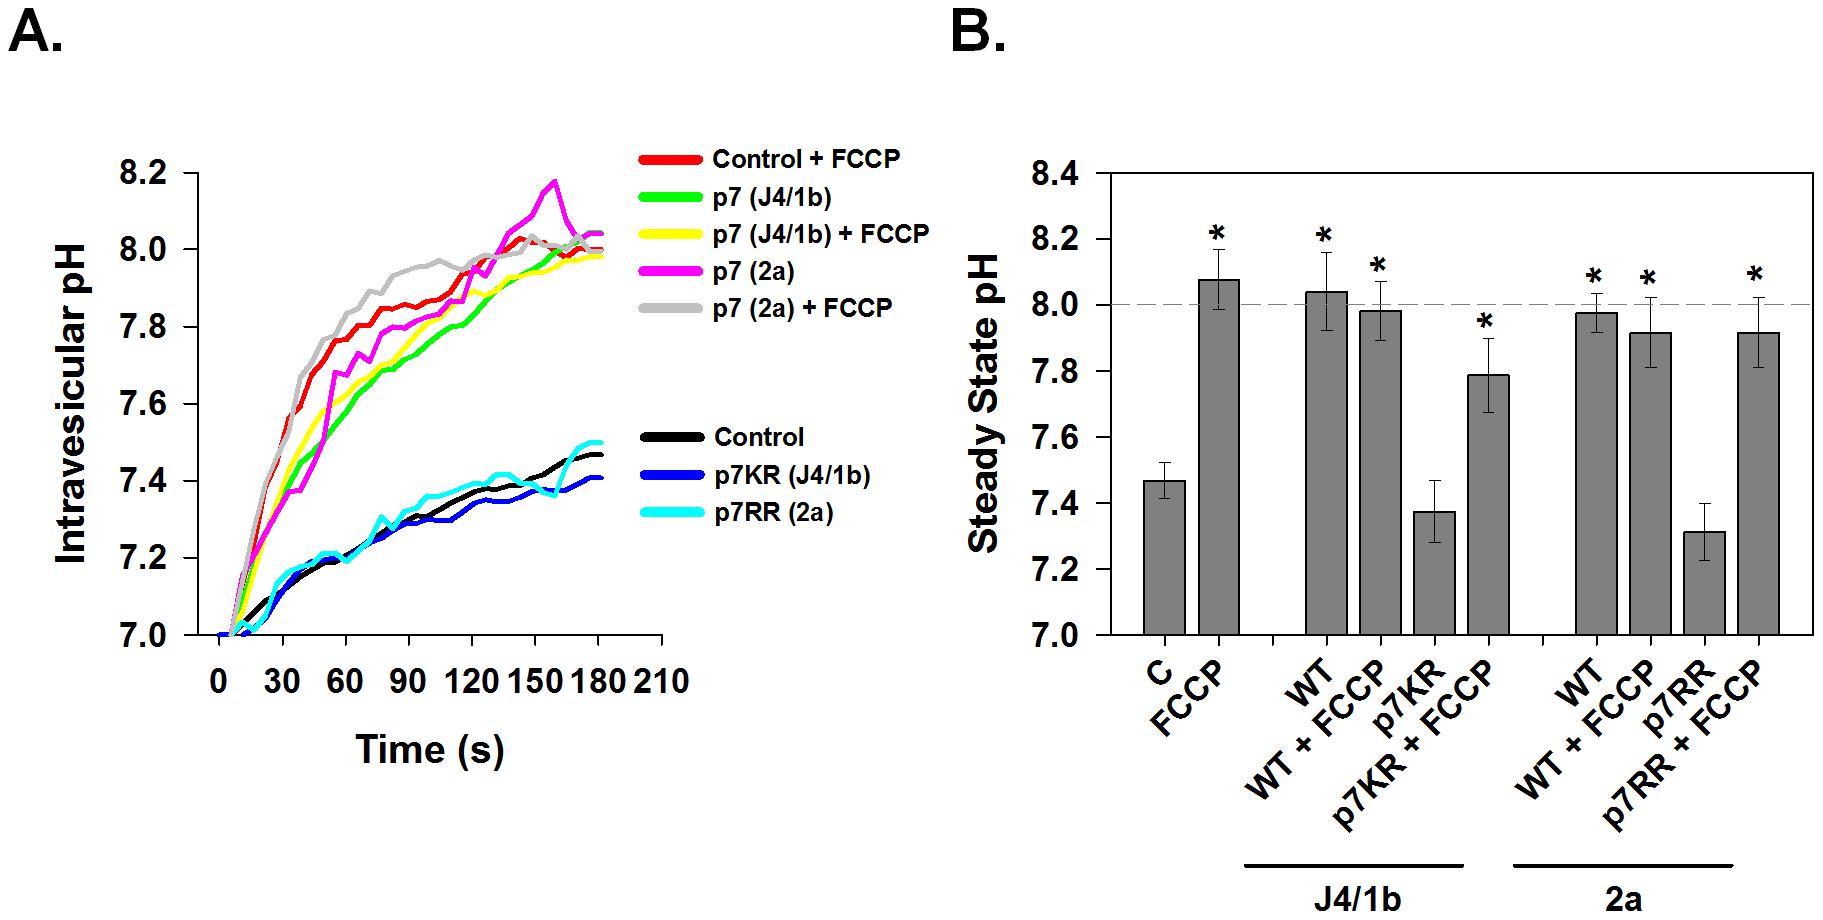 Conductive properties of HCV p7 proteins.